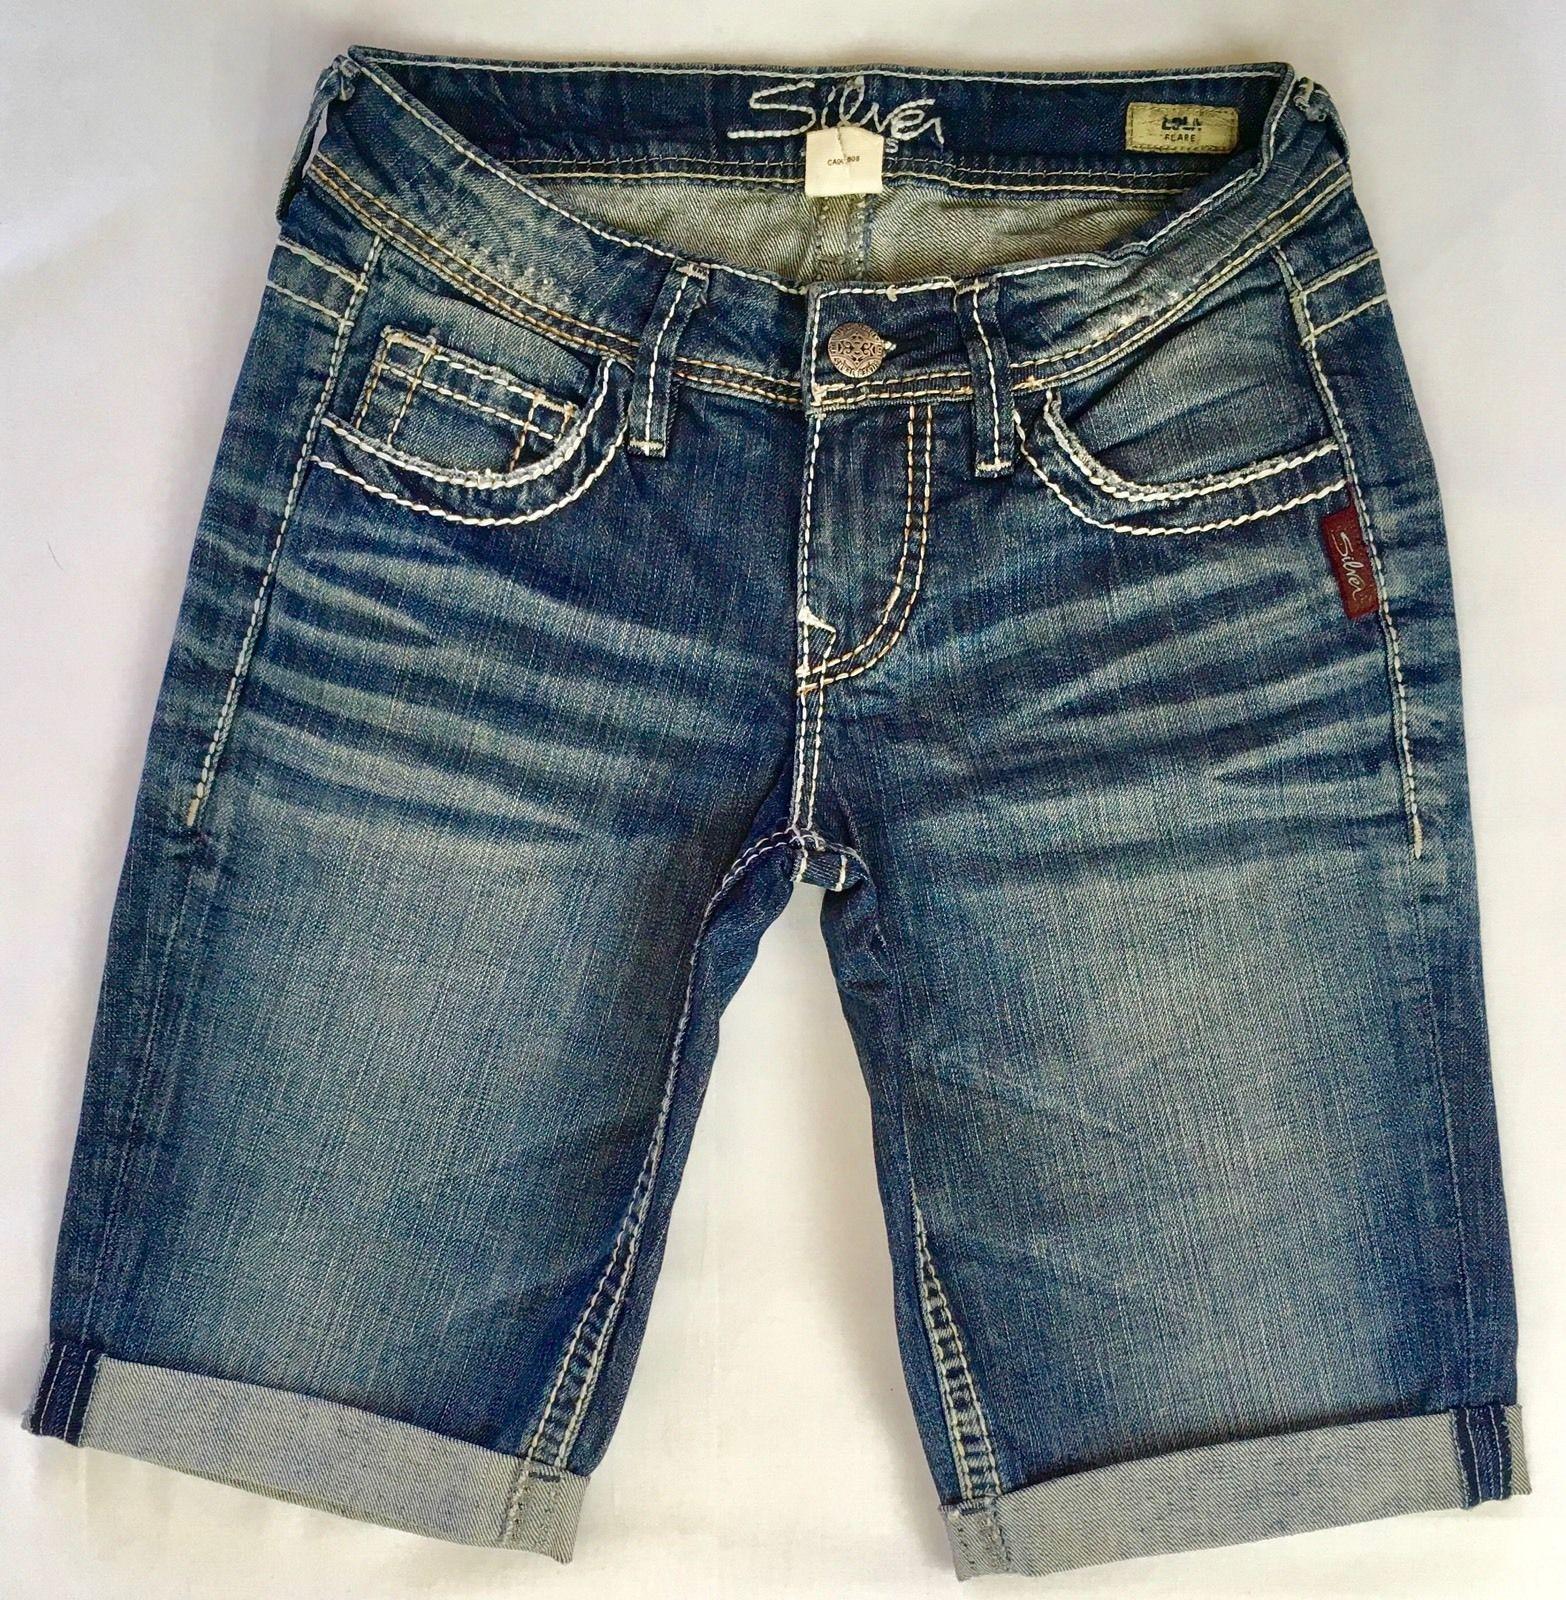 New Silver Jeans Sale Low Rise Lola Denim Stretch Jean Mid Shorts Size 25